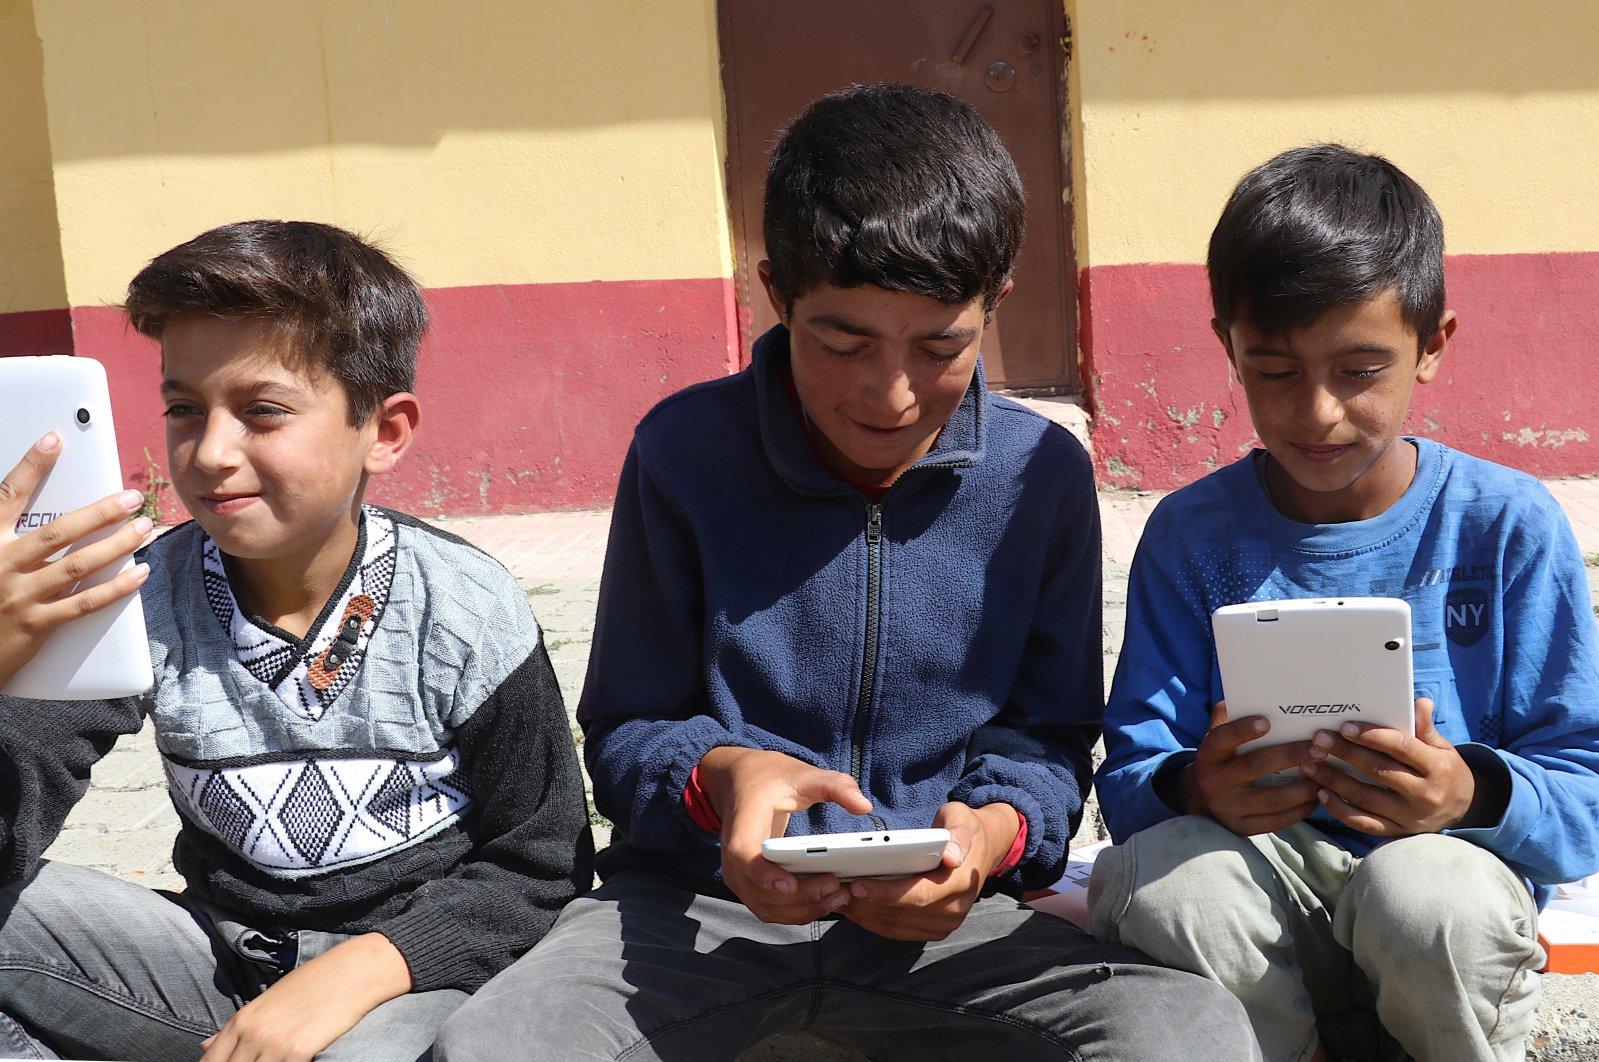 Children use tablet computers in Ağrı, eastern Turkey, Sept. 19, 2020. (İHA Photo)